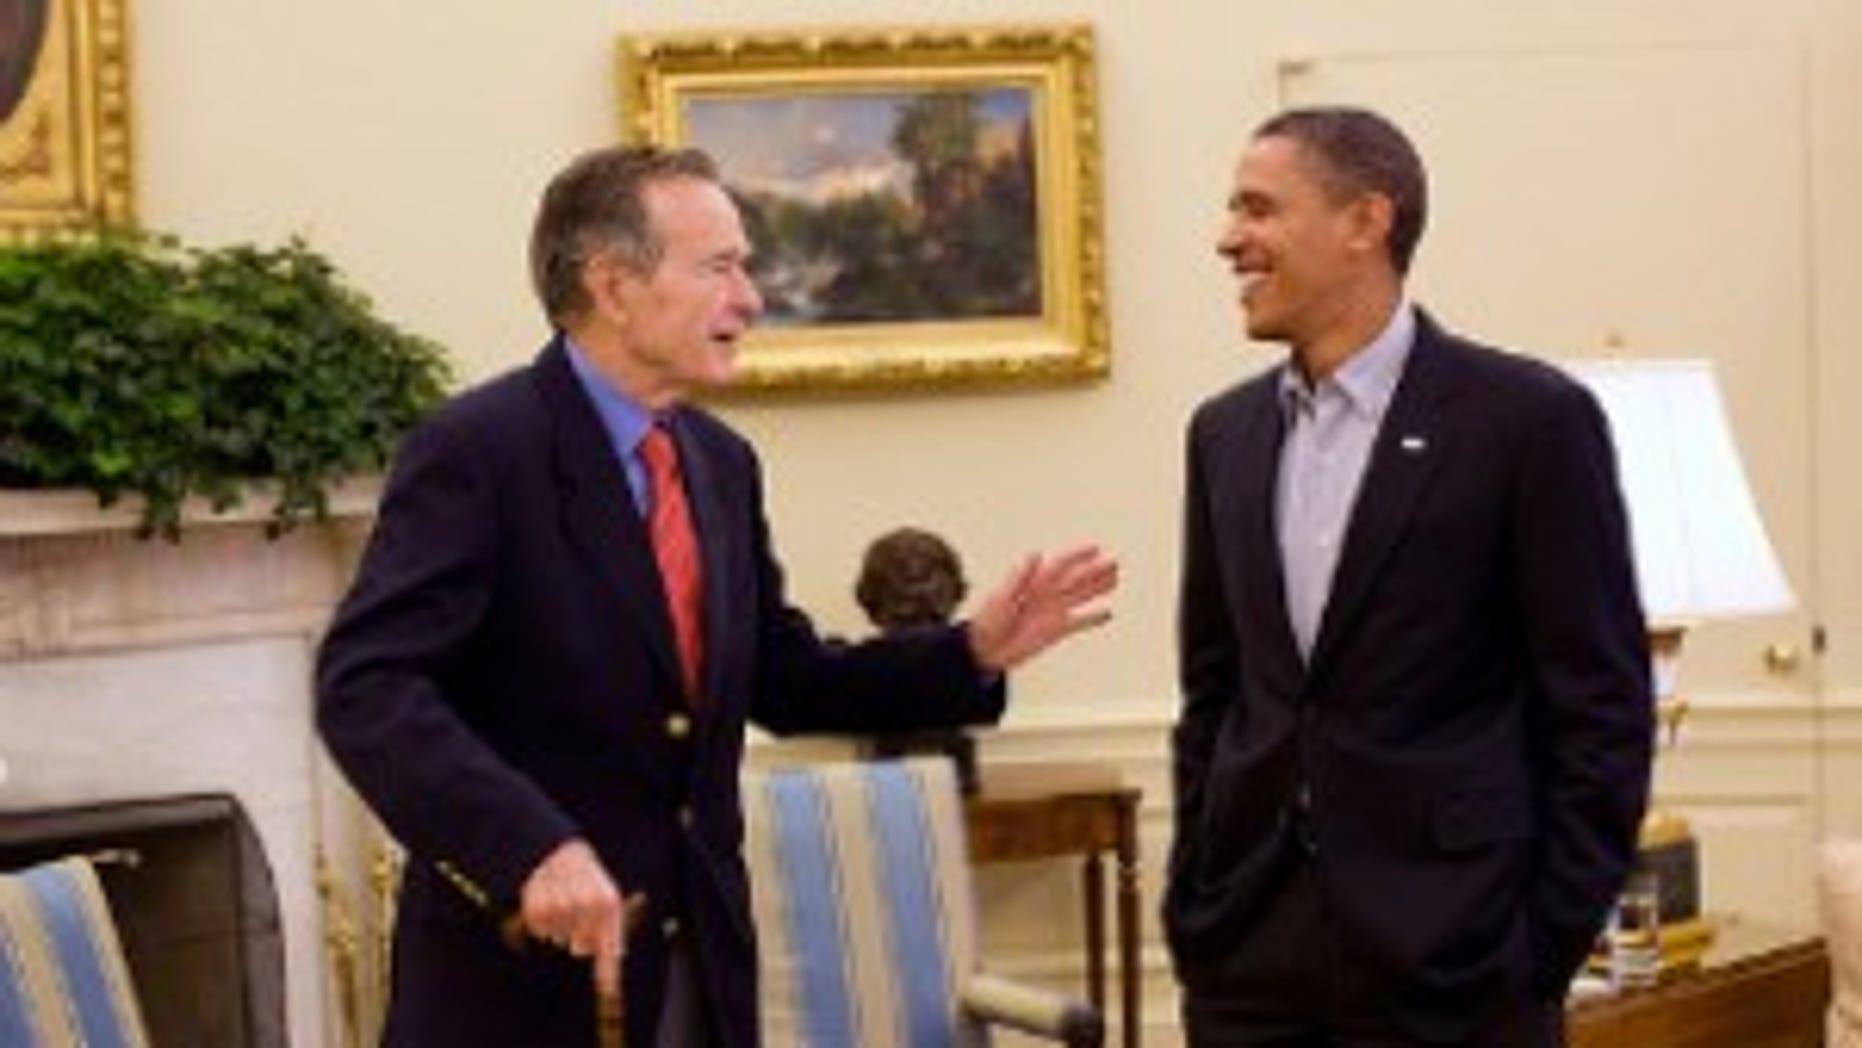 Former President George H.W. Bush makes a social call to President Obama.  White House Photo